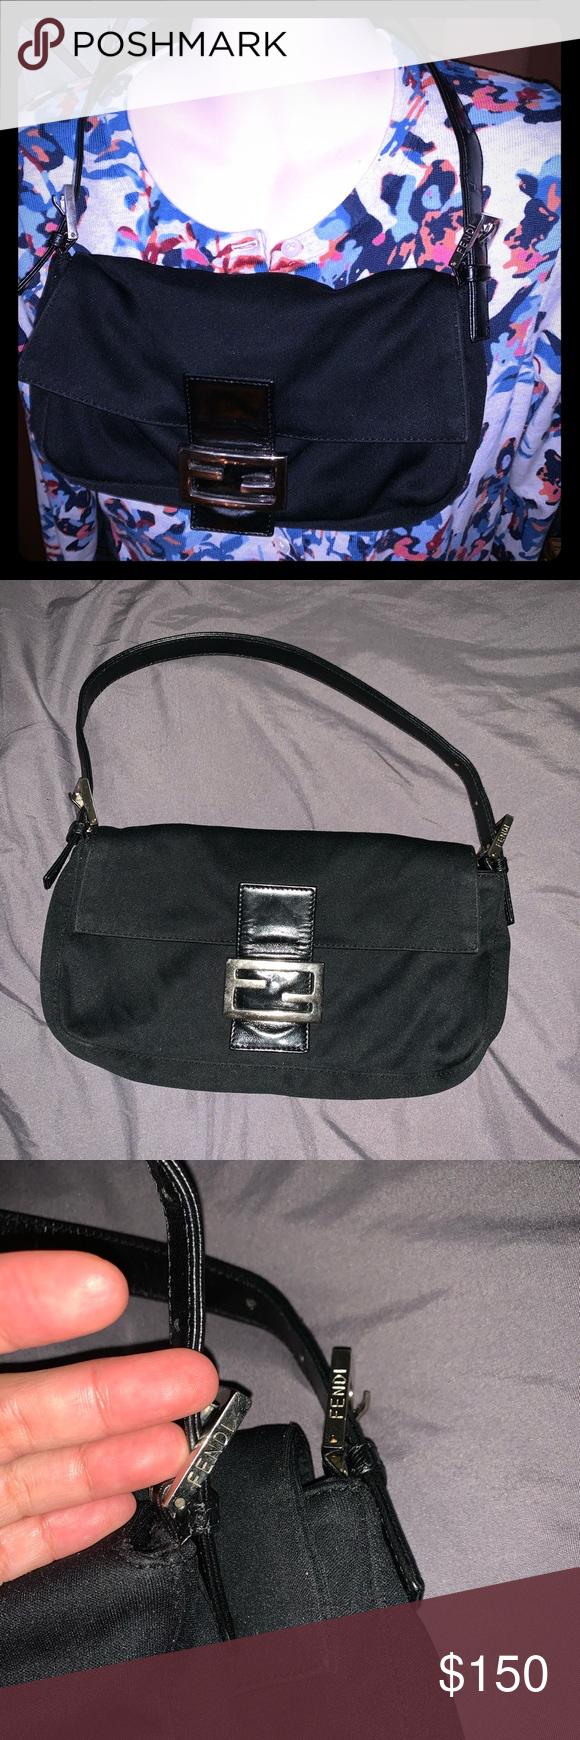 Fendi Small Baguette Handbag Shoulder